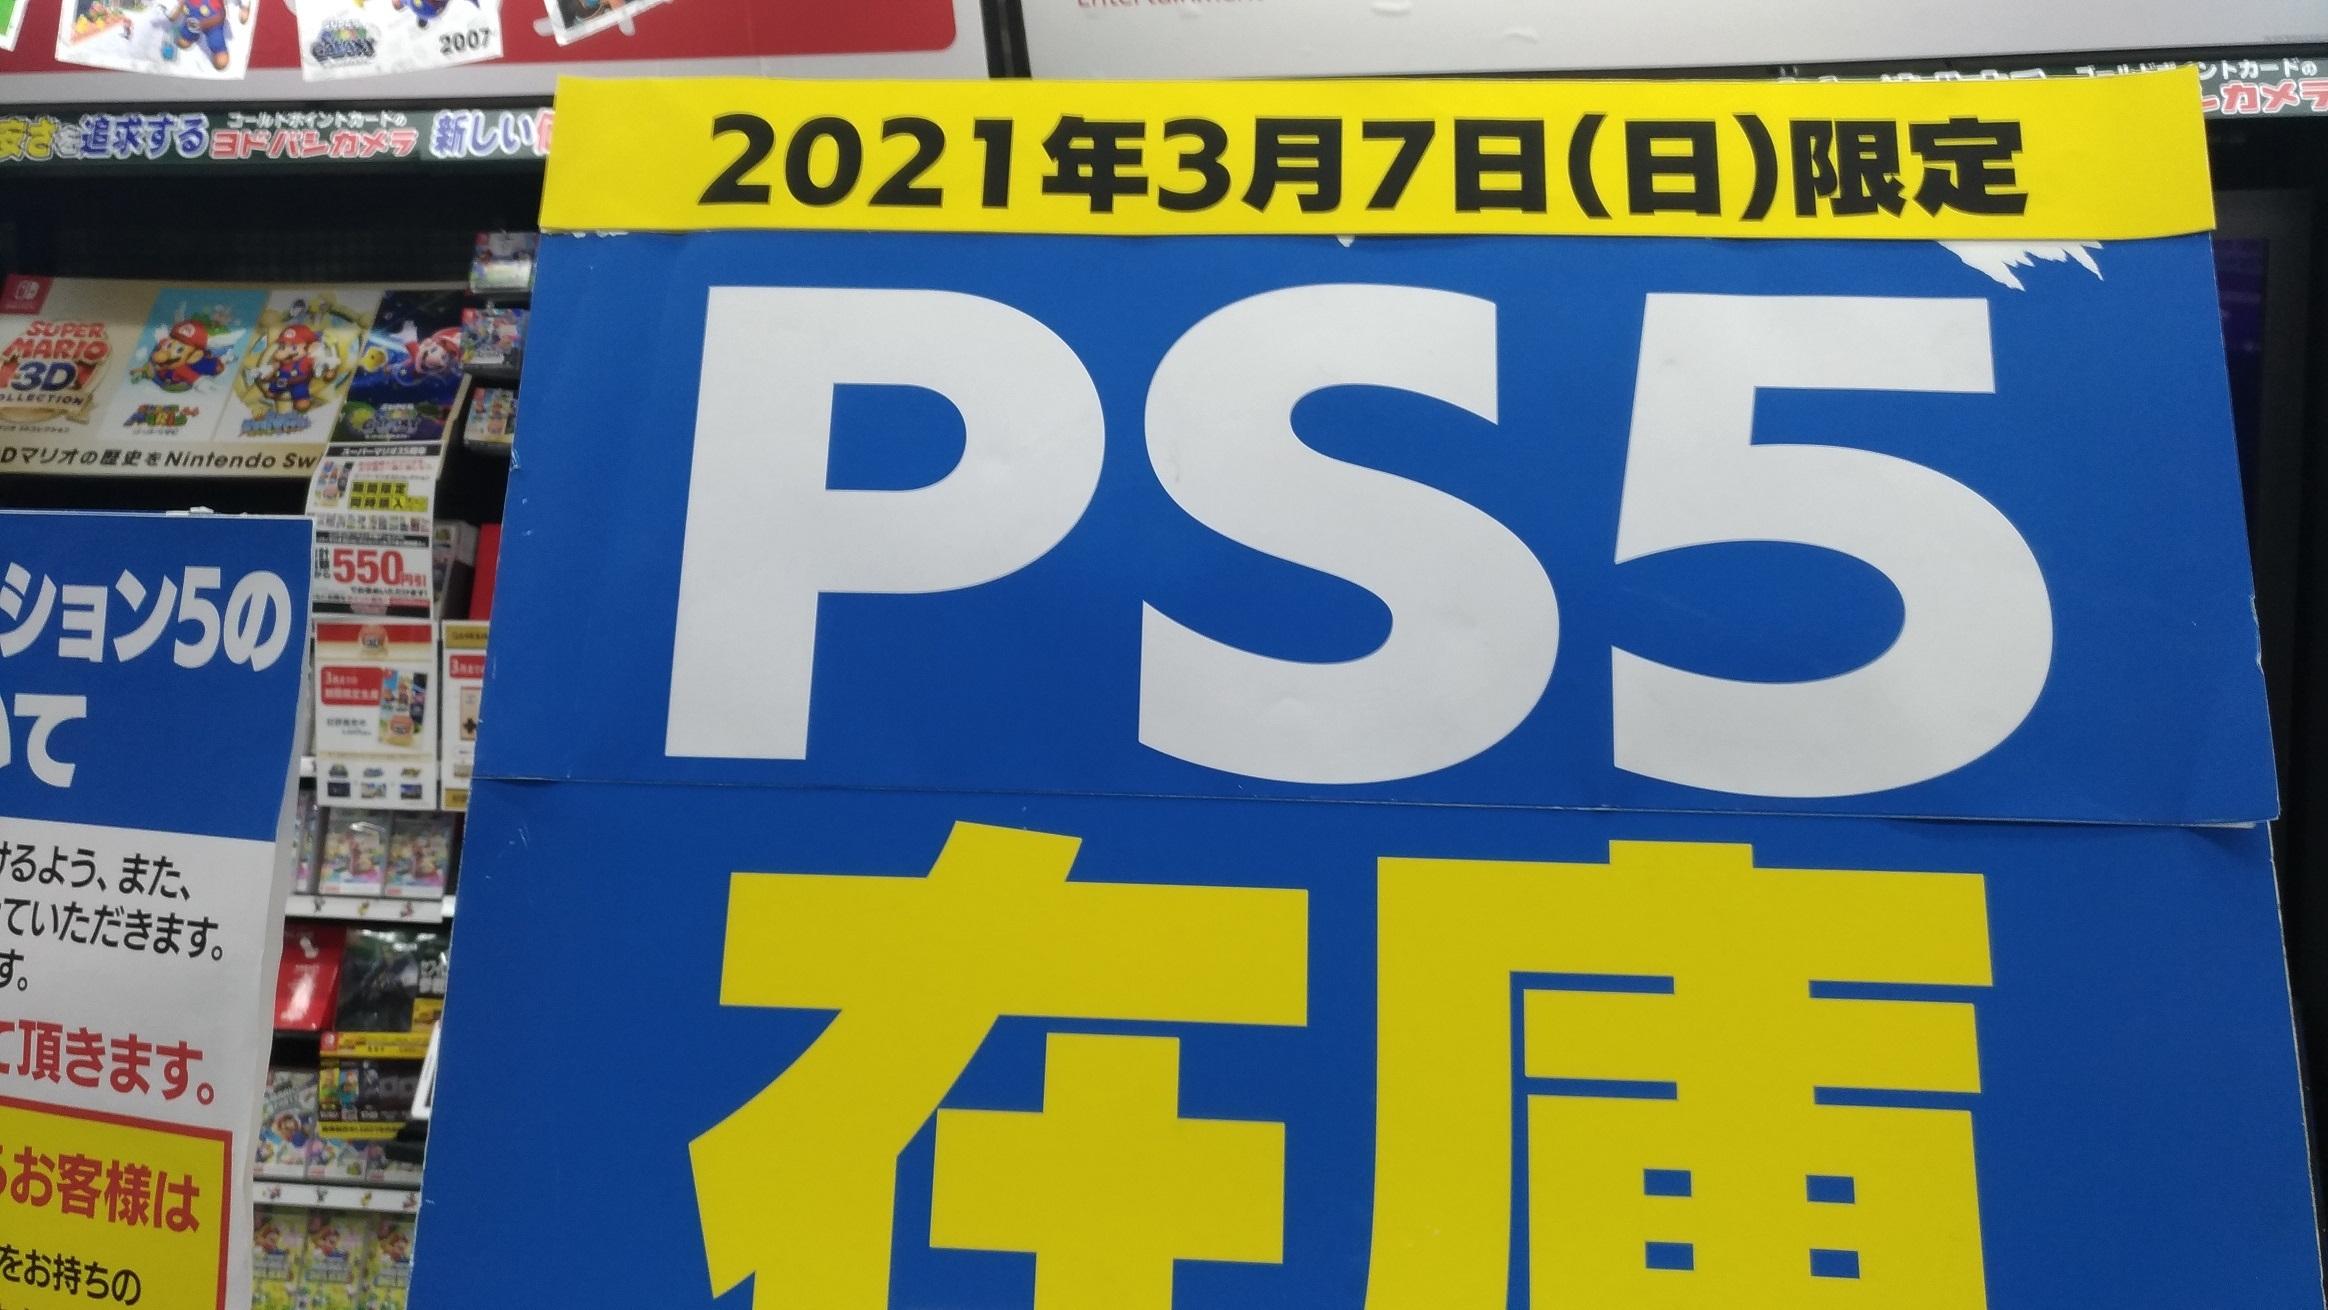 ps5_0307_2021_umeda_osaka.jpg